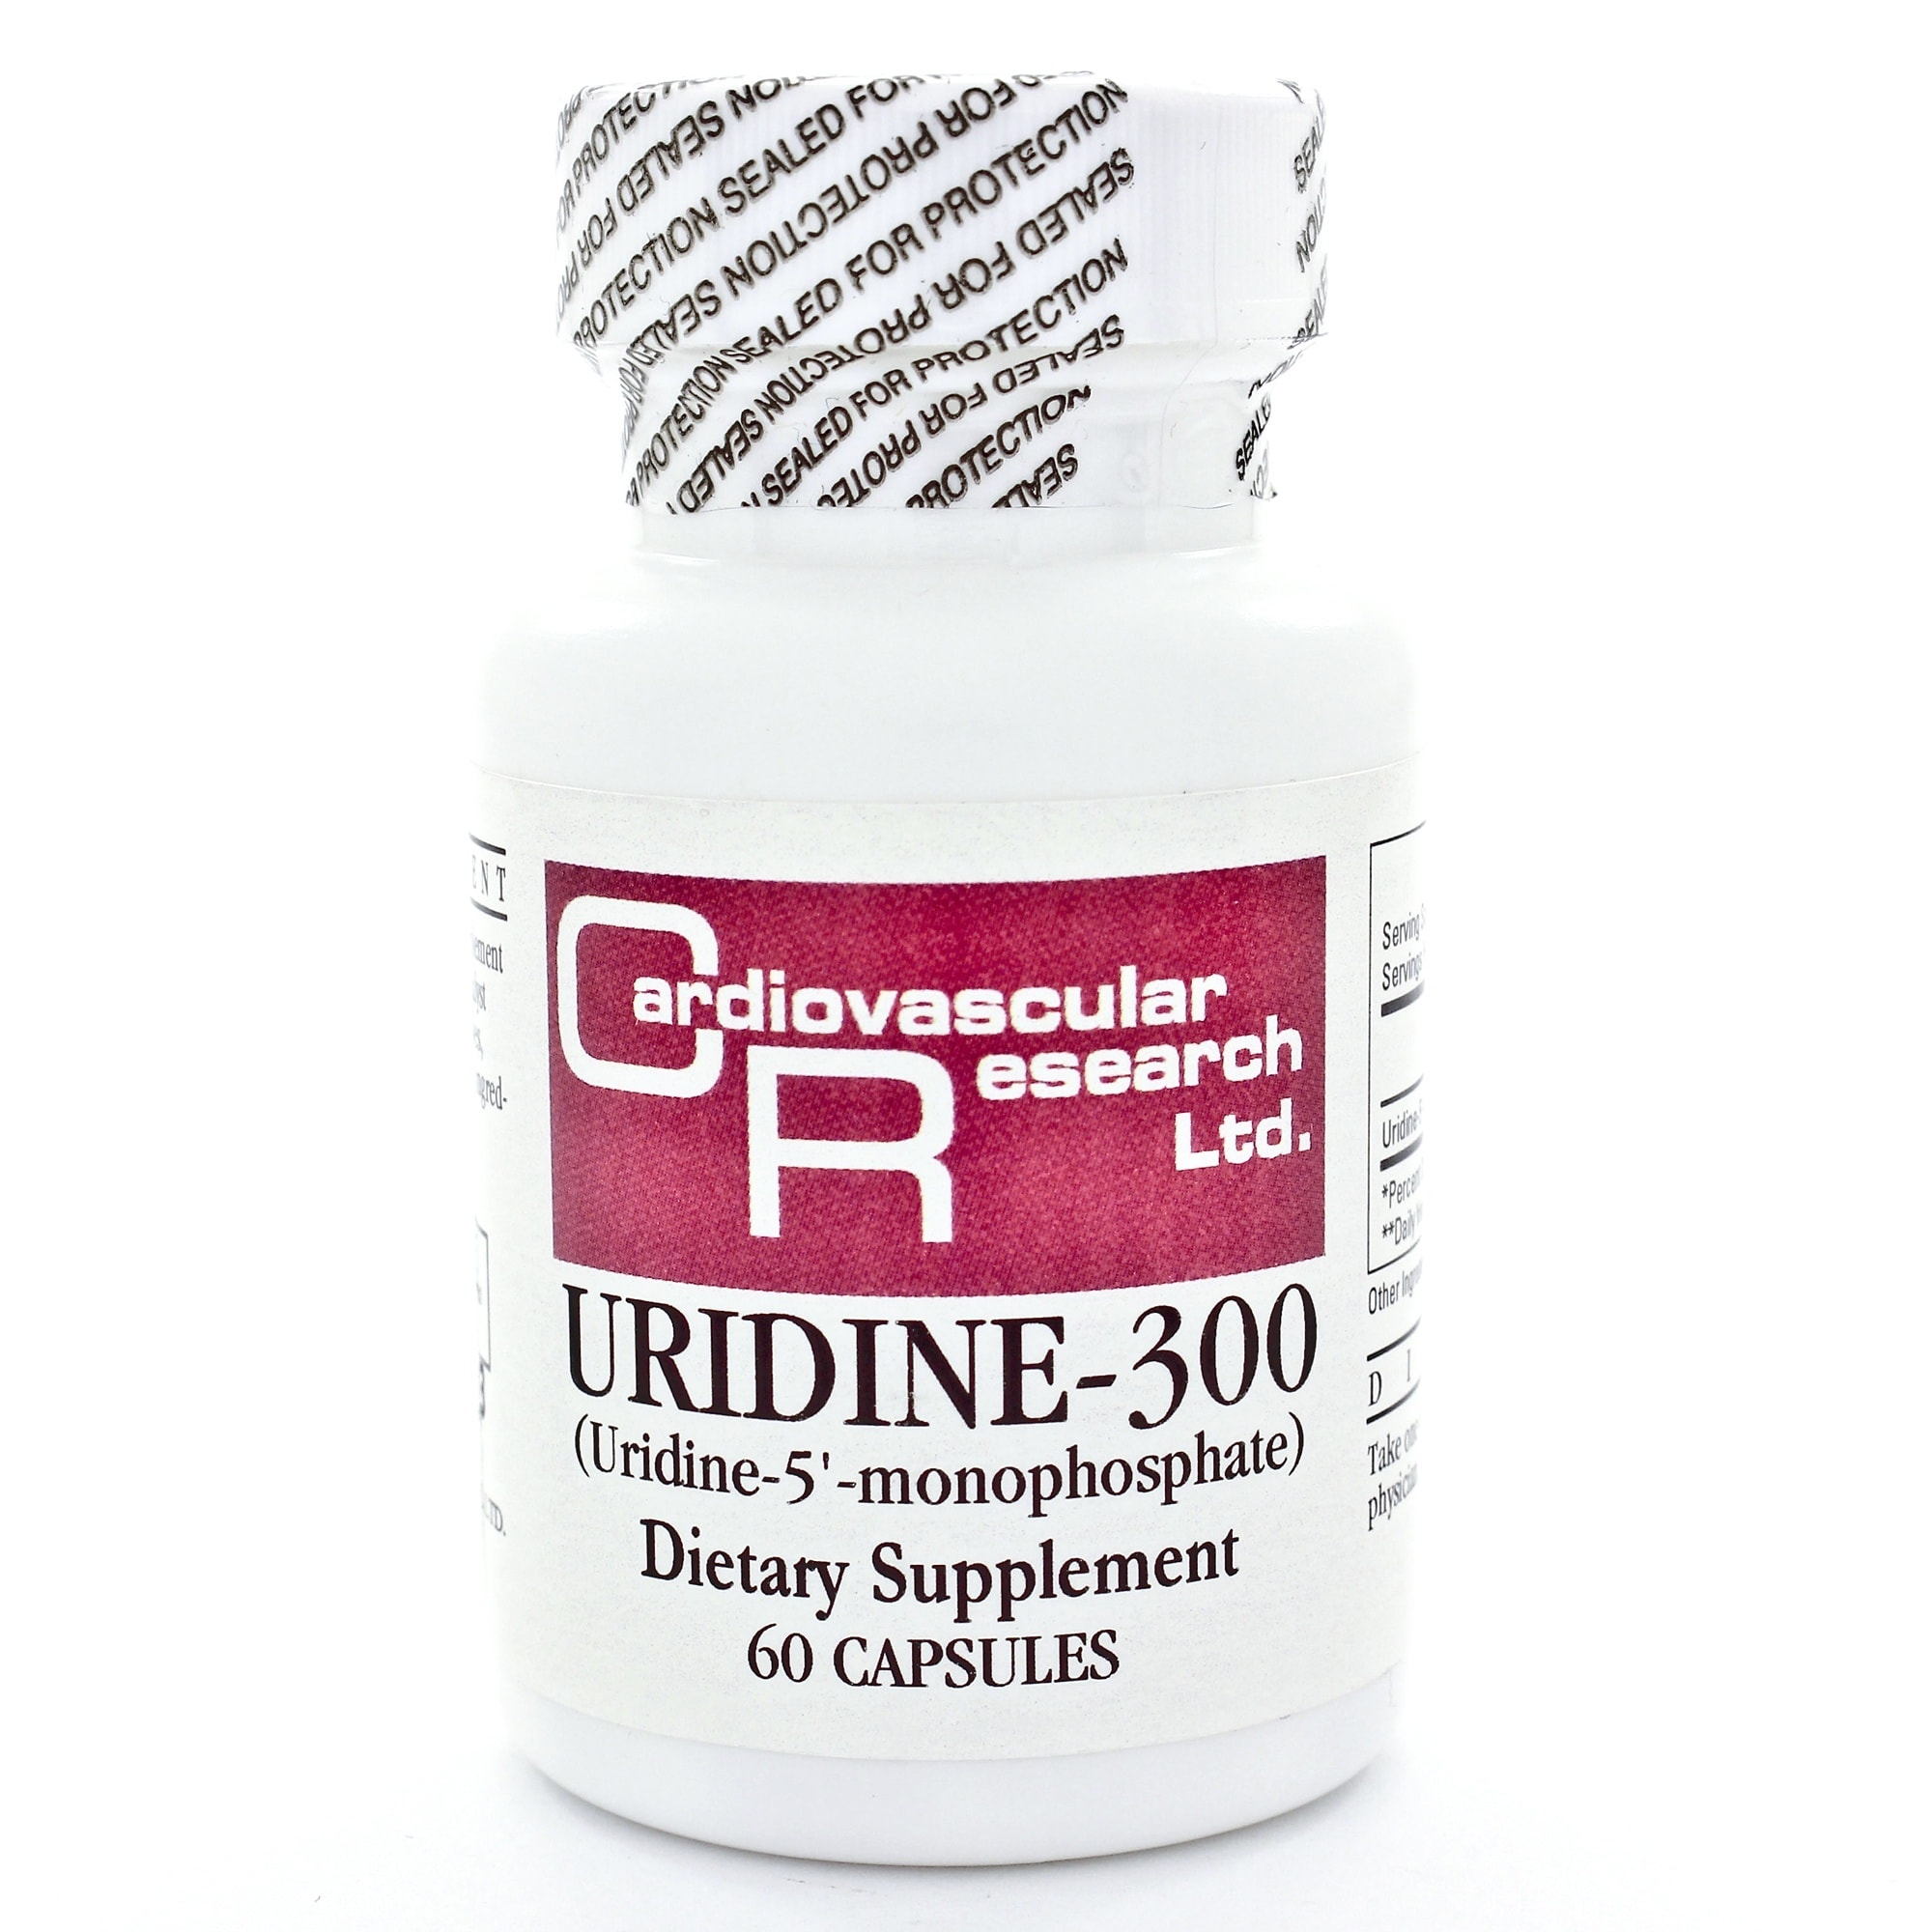 Uridine 5'-monophosphate 300 mg - 60 capsules